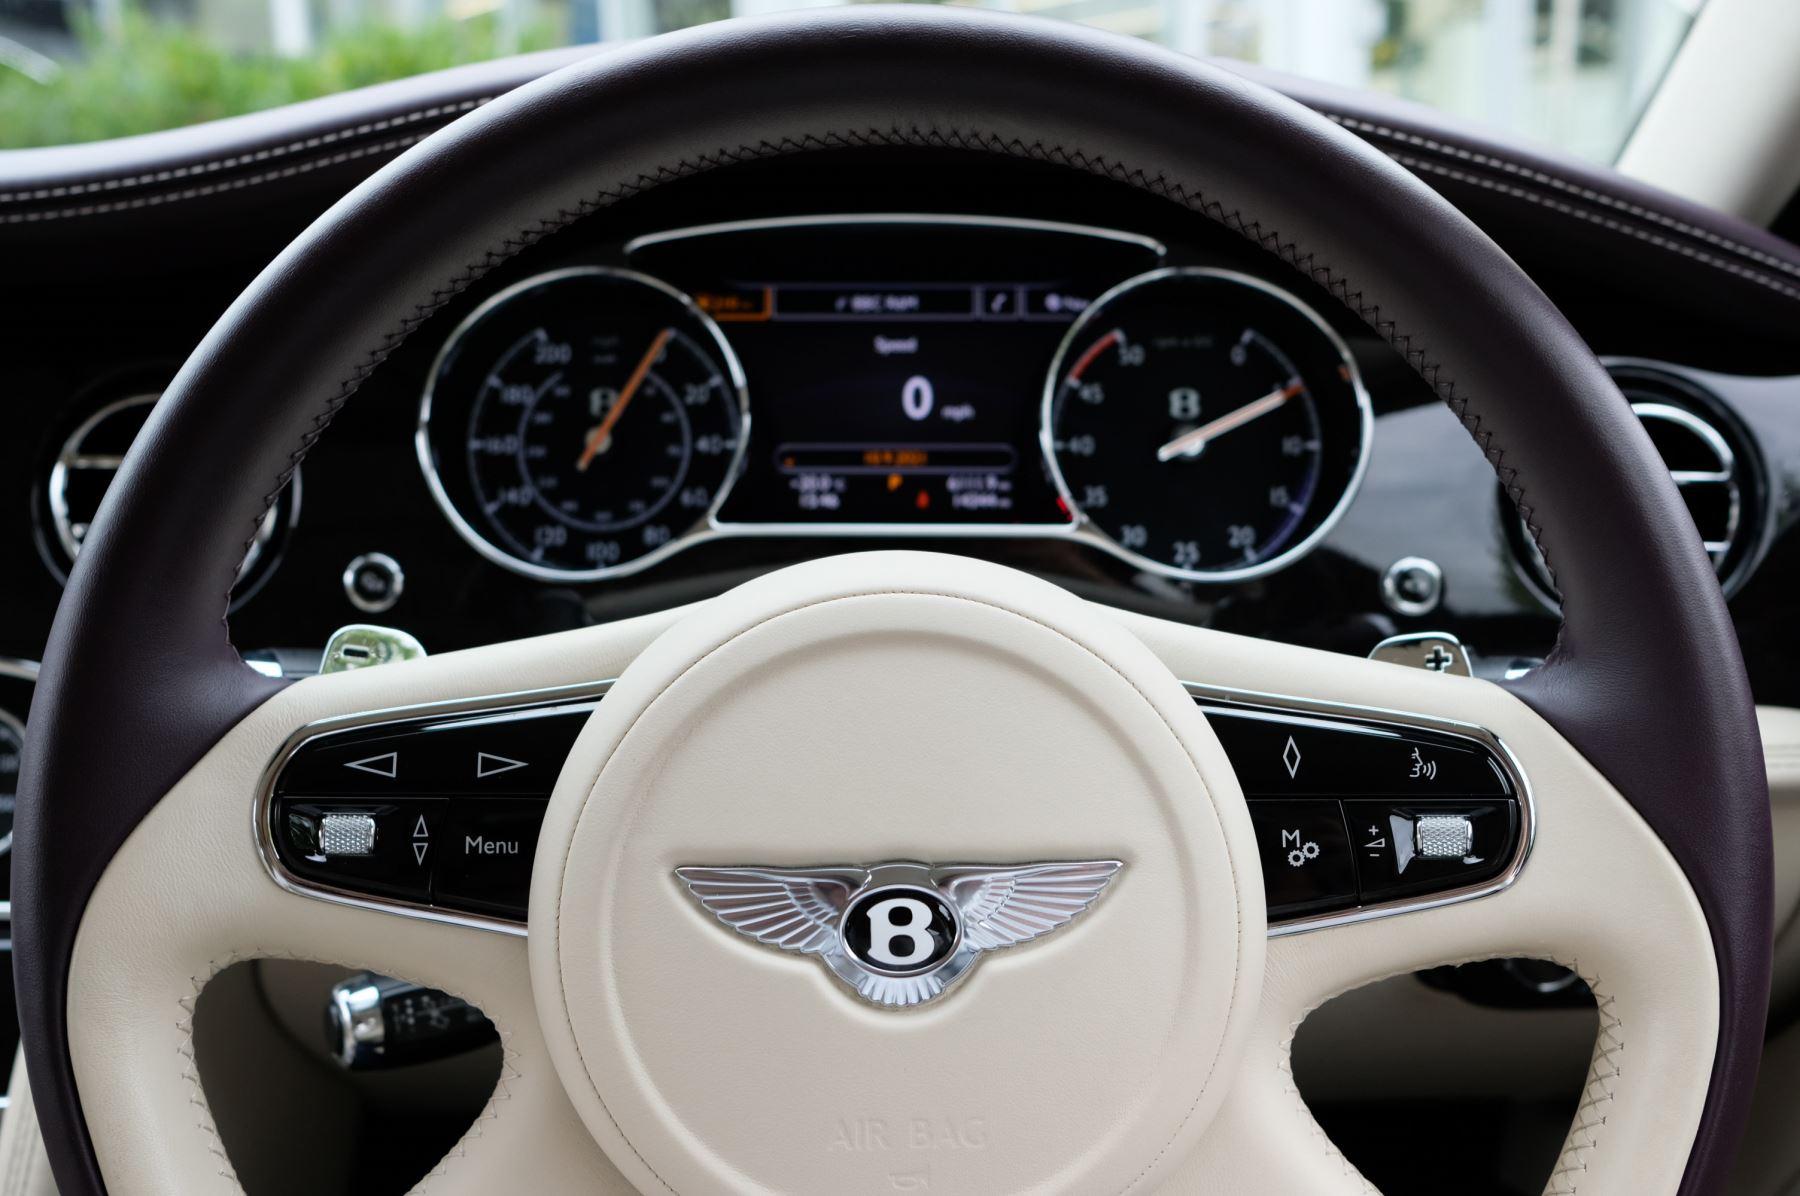 Bentley Mulsanne 6.8 V8 Speed - Speed Premier Specification image 14